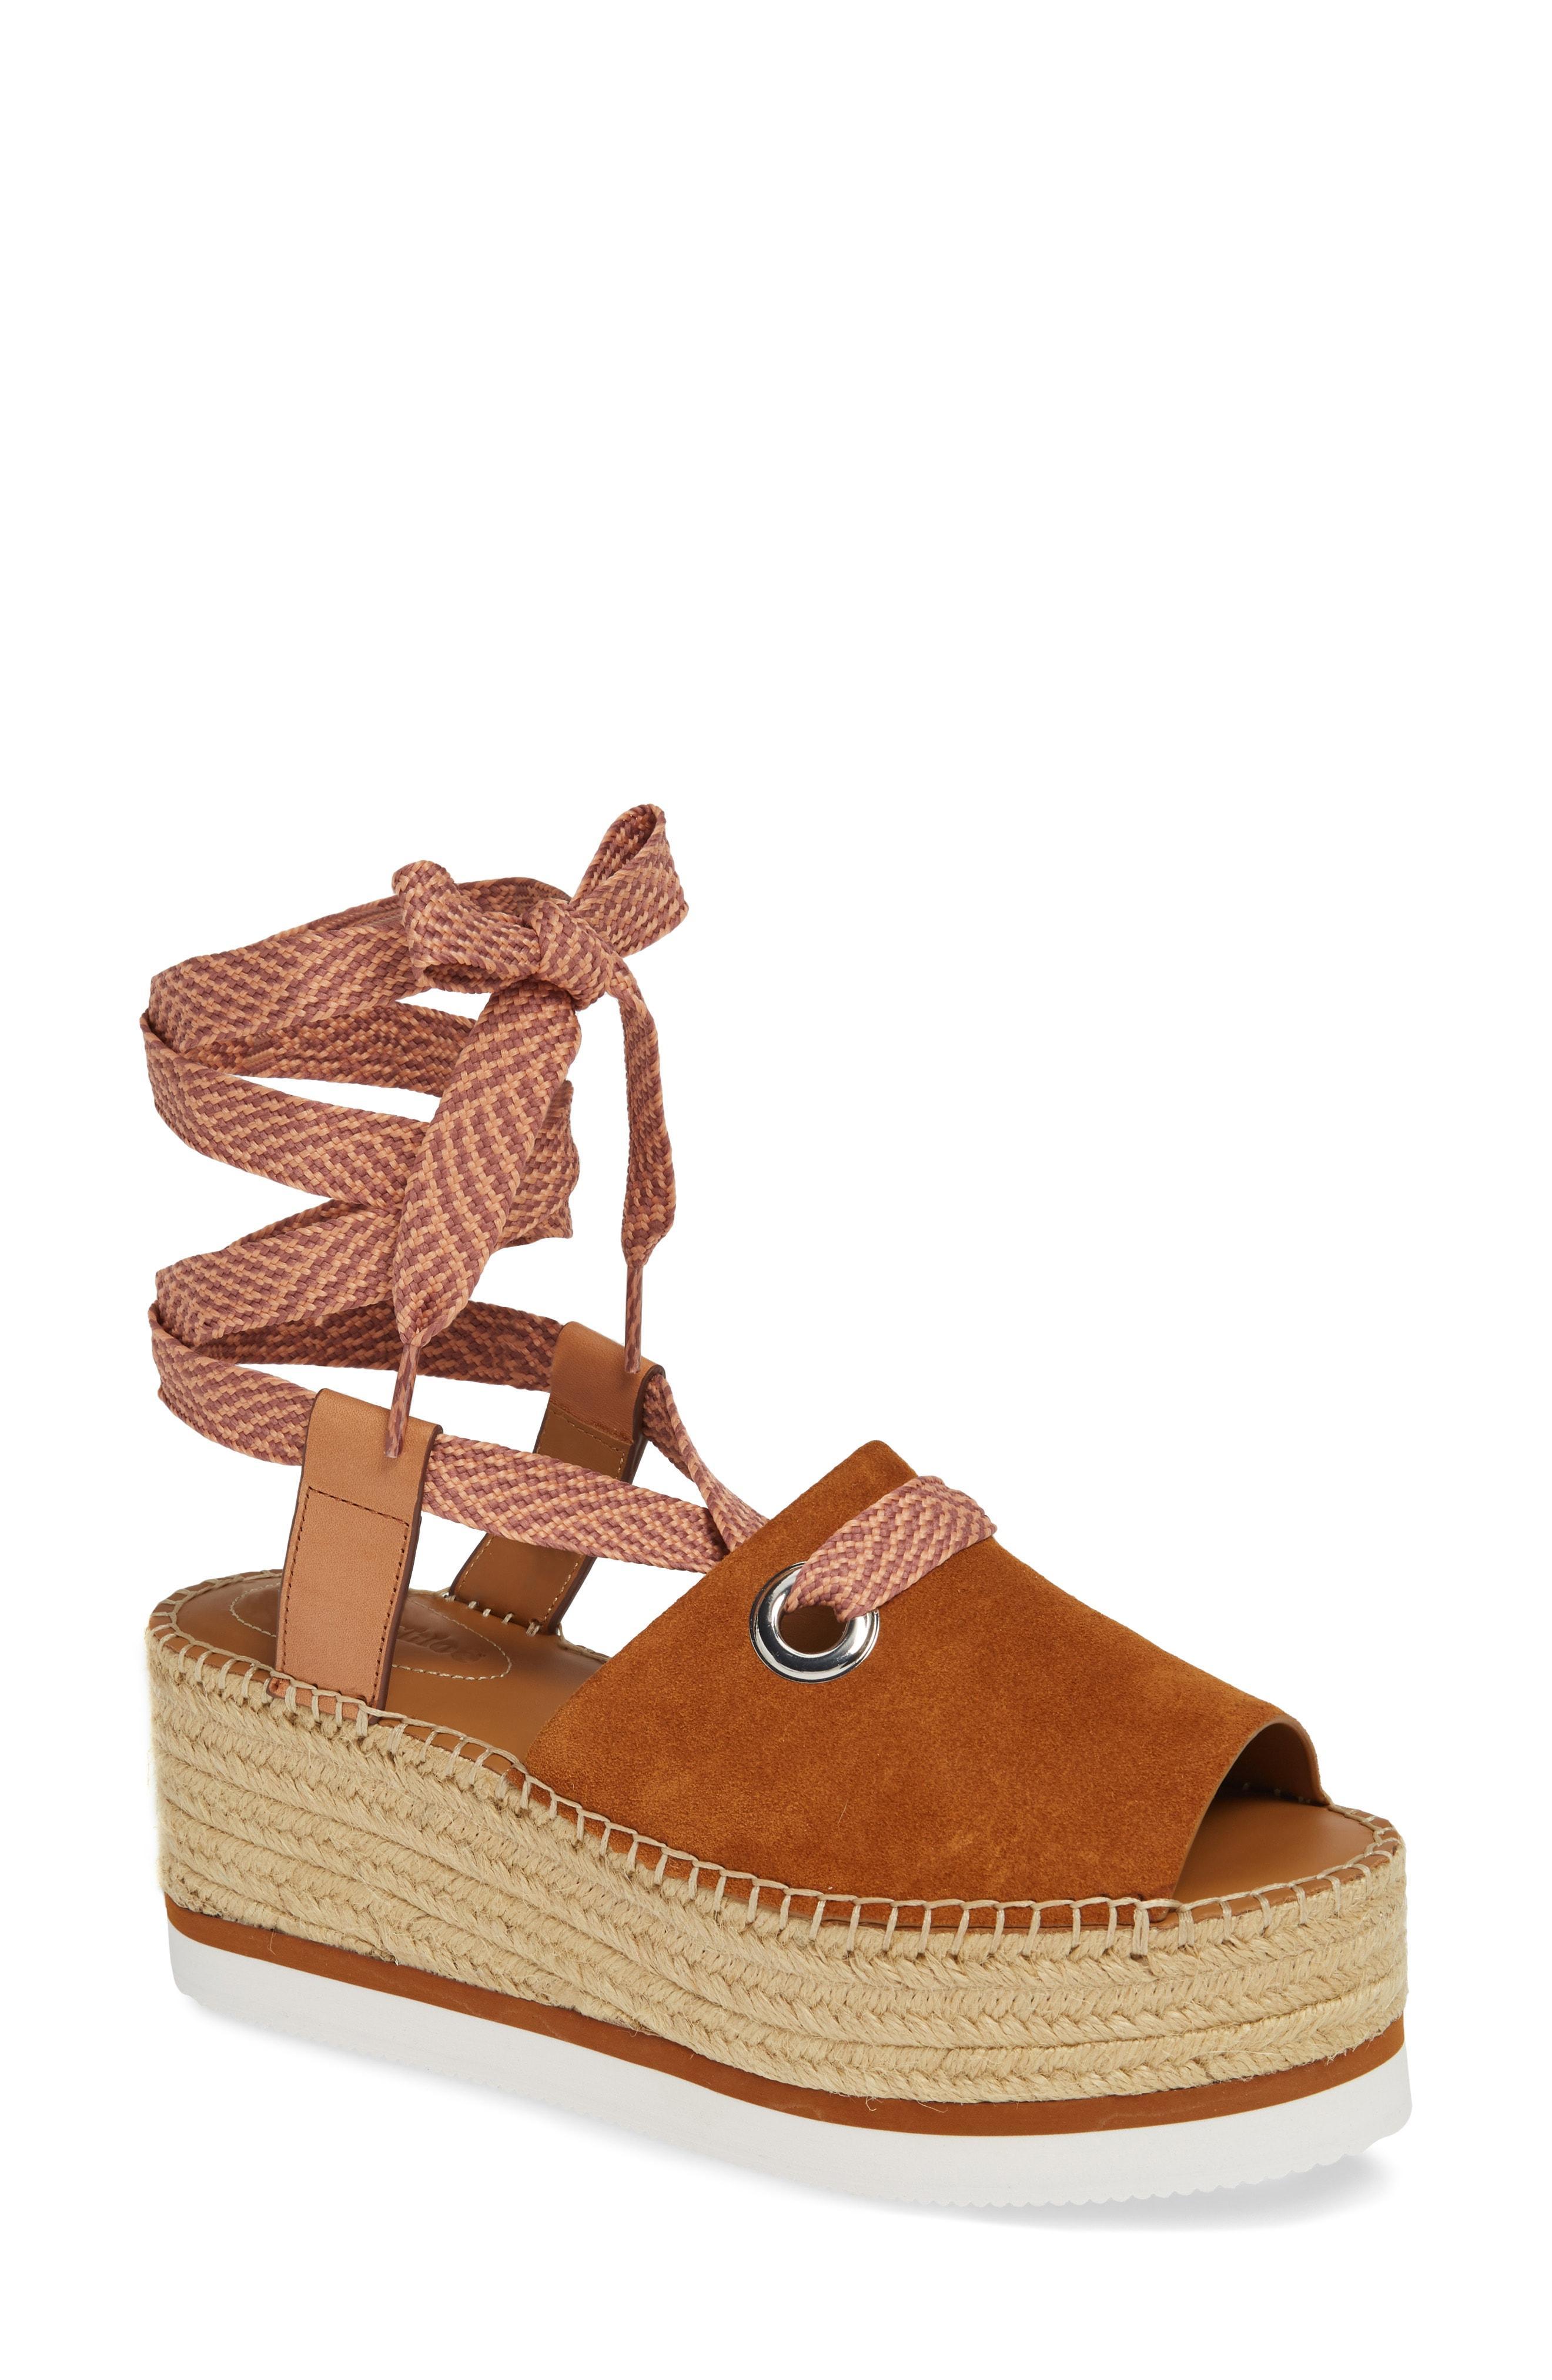 1c6161342905 Lyst - See By Chloé Glyn Amber Platform Ankle Wrap Sandal in Brown